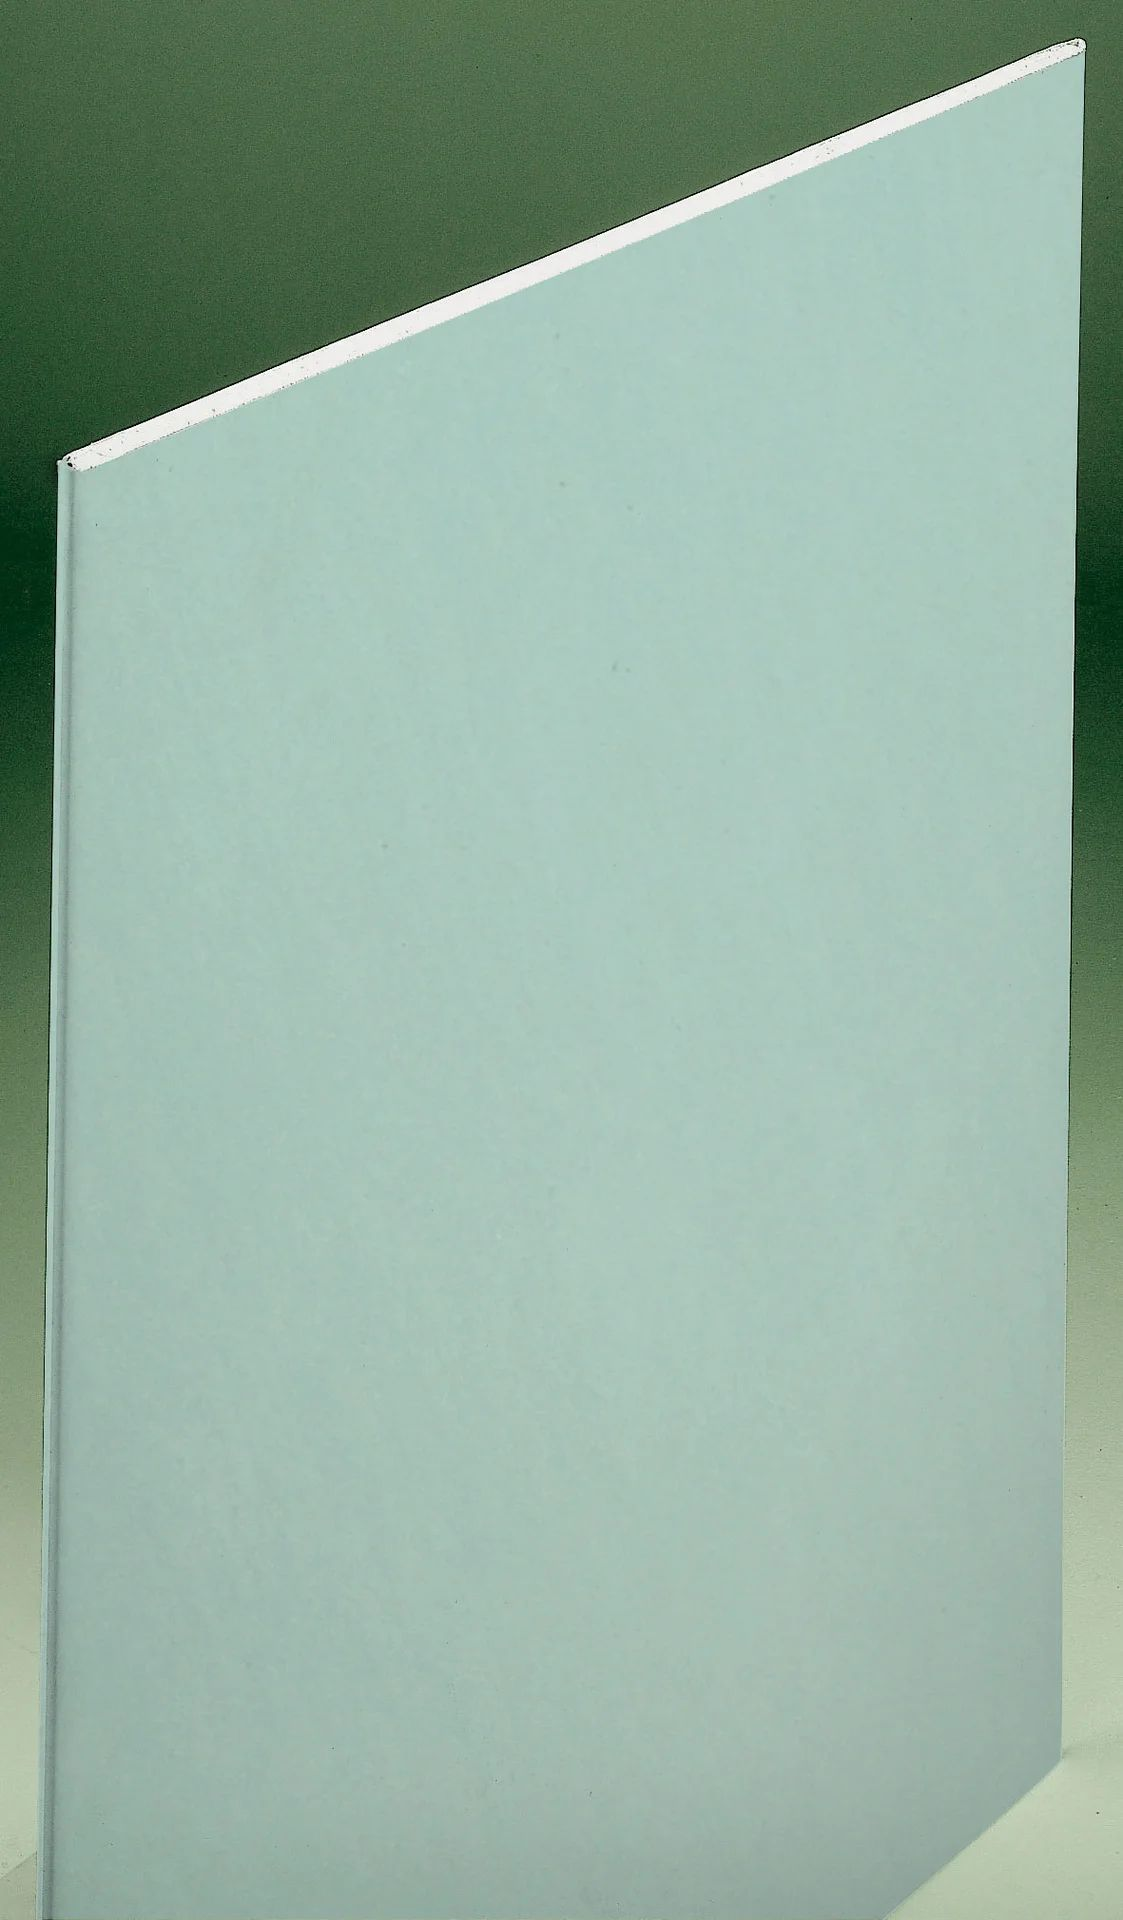 Plaque De Platre Ba 13 H 250 X L 120 Cm Hydrofuge Fassa Bortolo Leroy Merlin